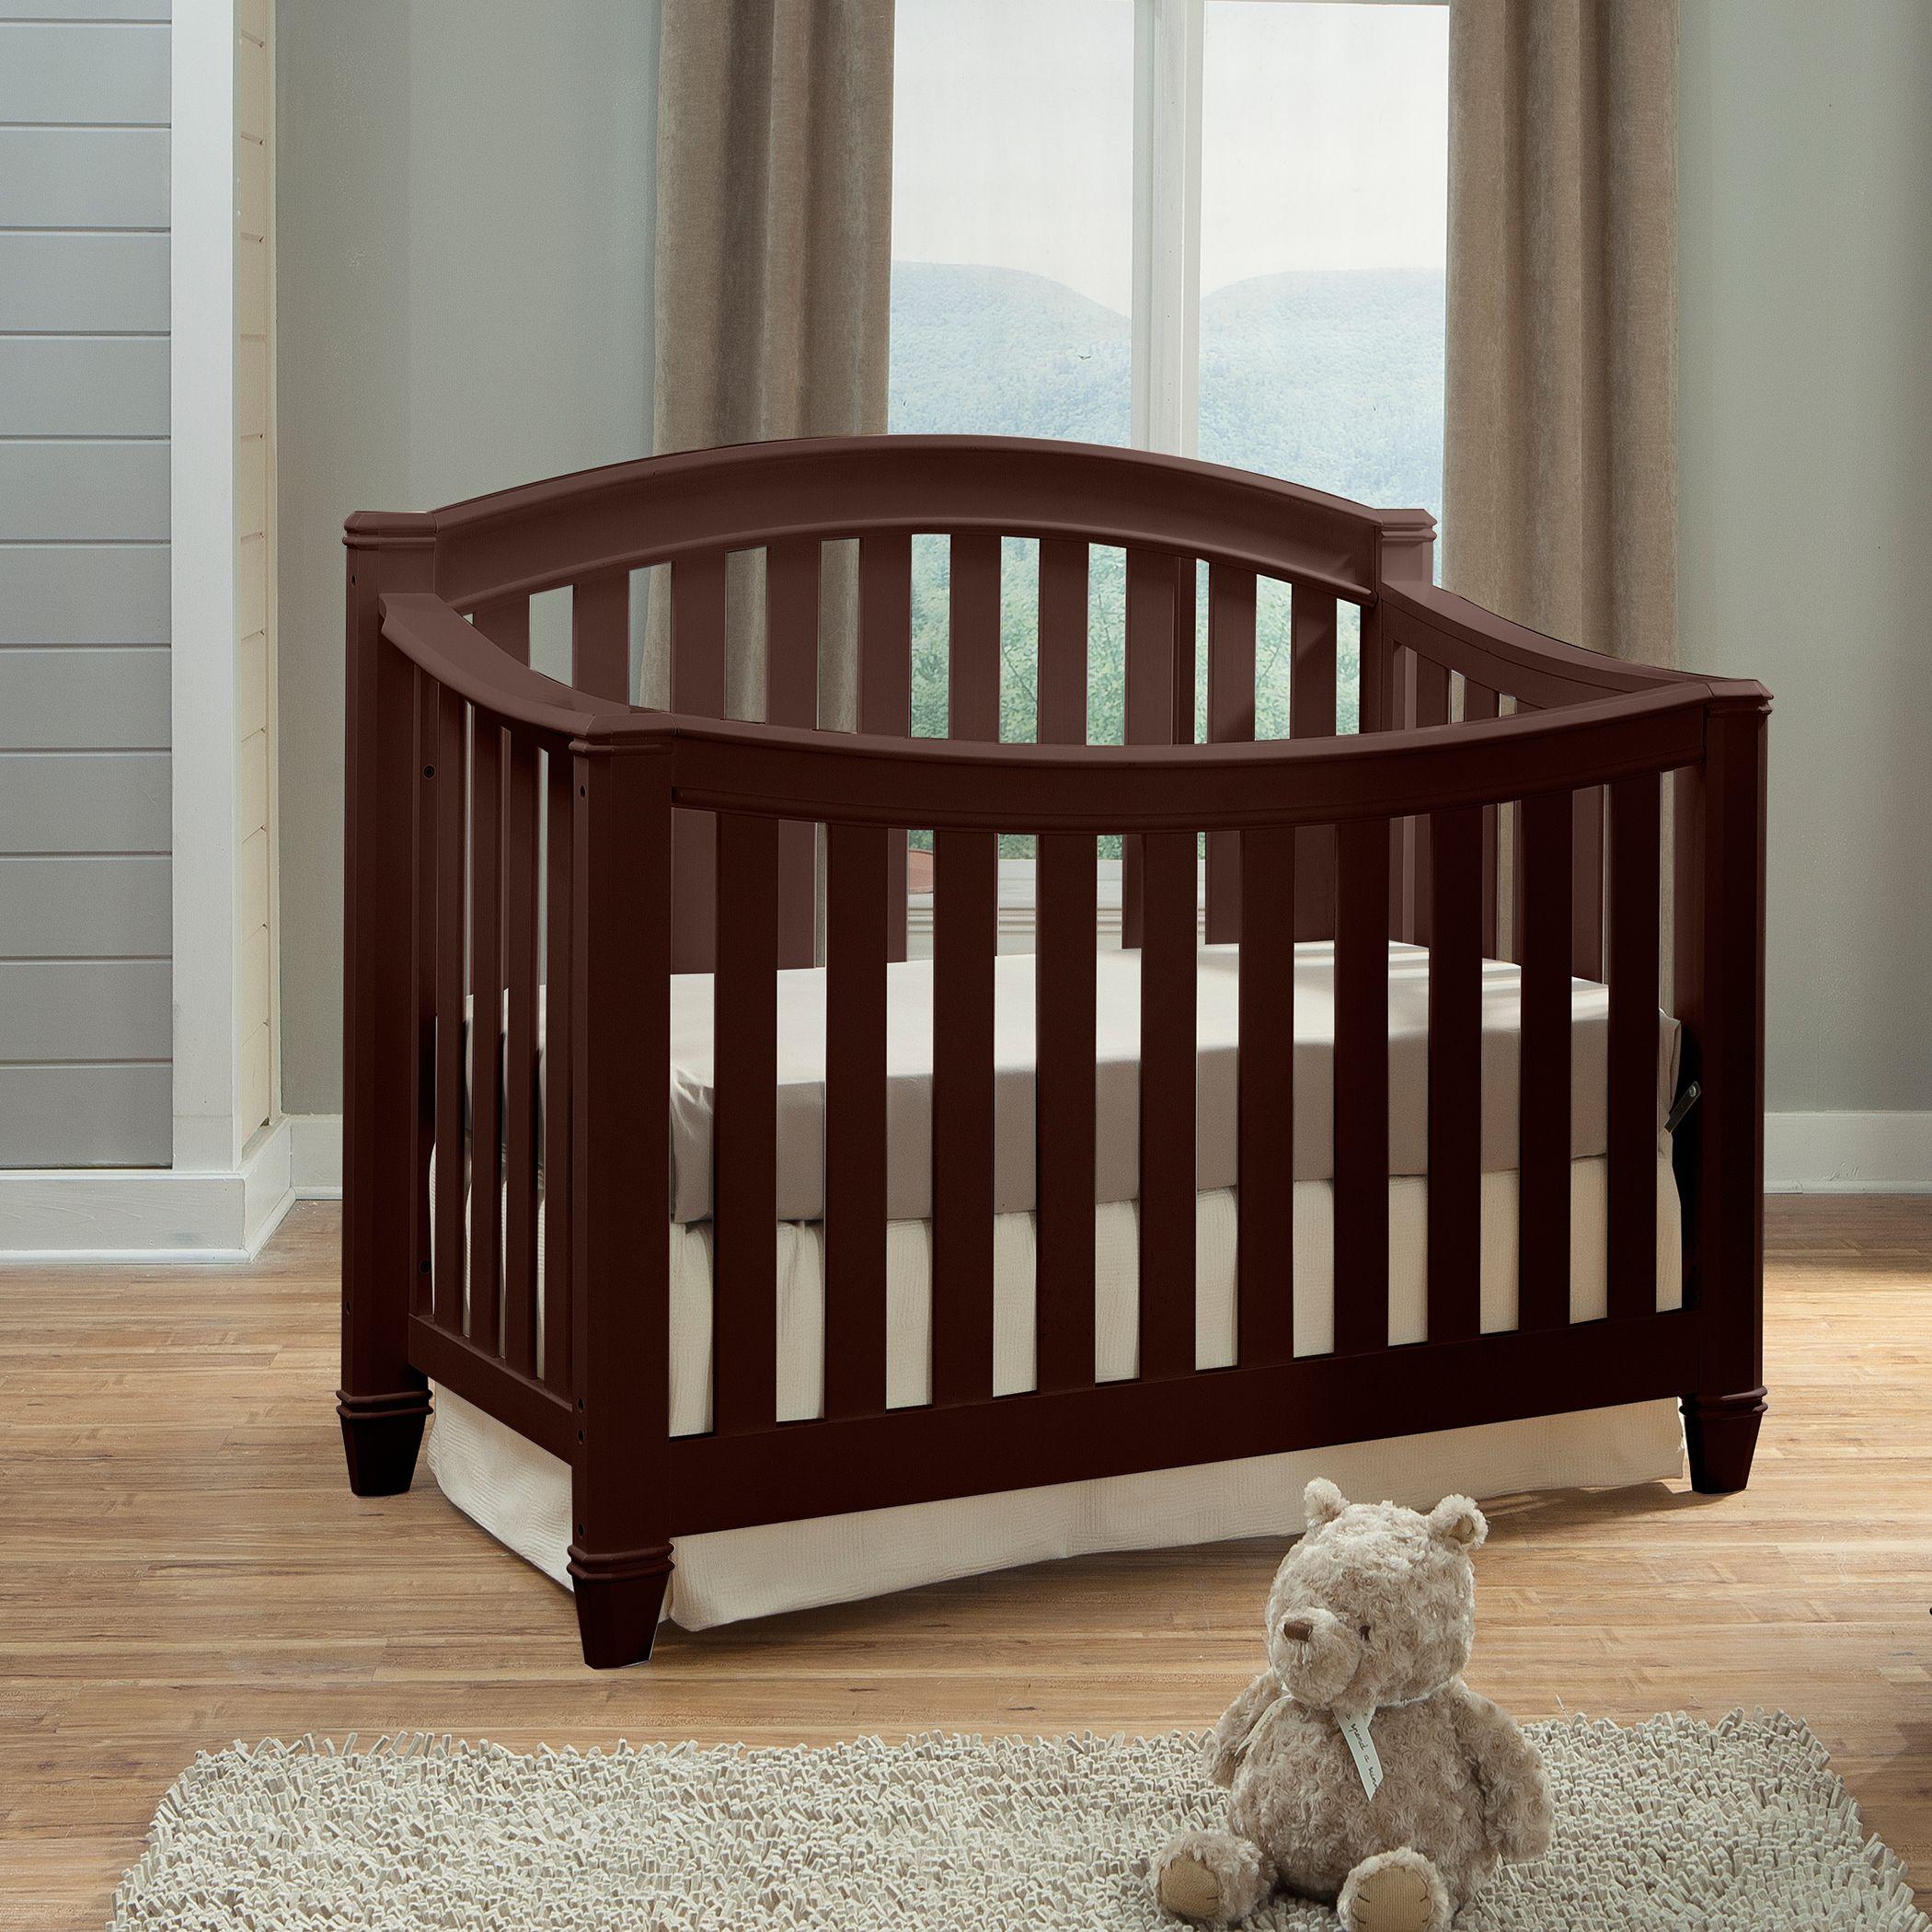 Superior Thomasville Kids Highlands 4 In 1 Convertible Crib